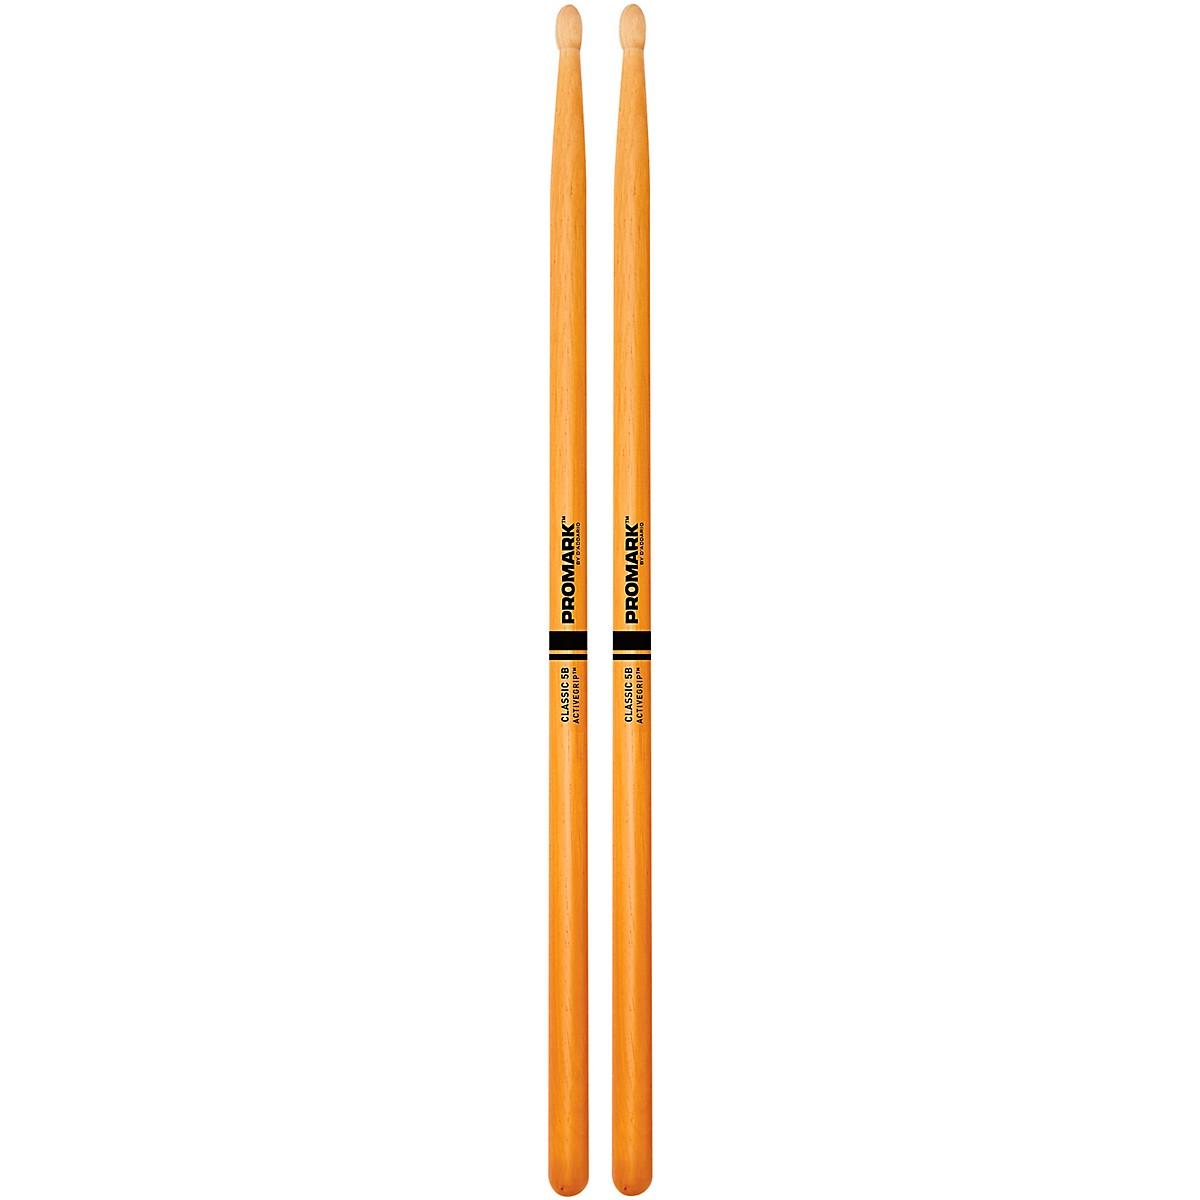 Promark Clear ActiveGrip Drumsticks